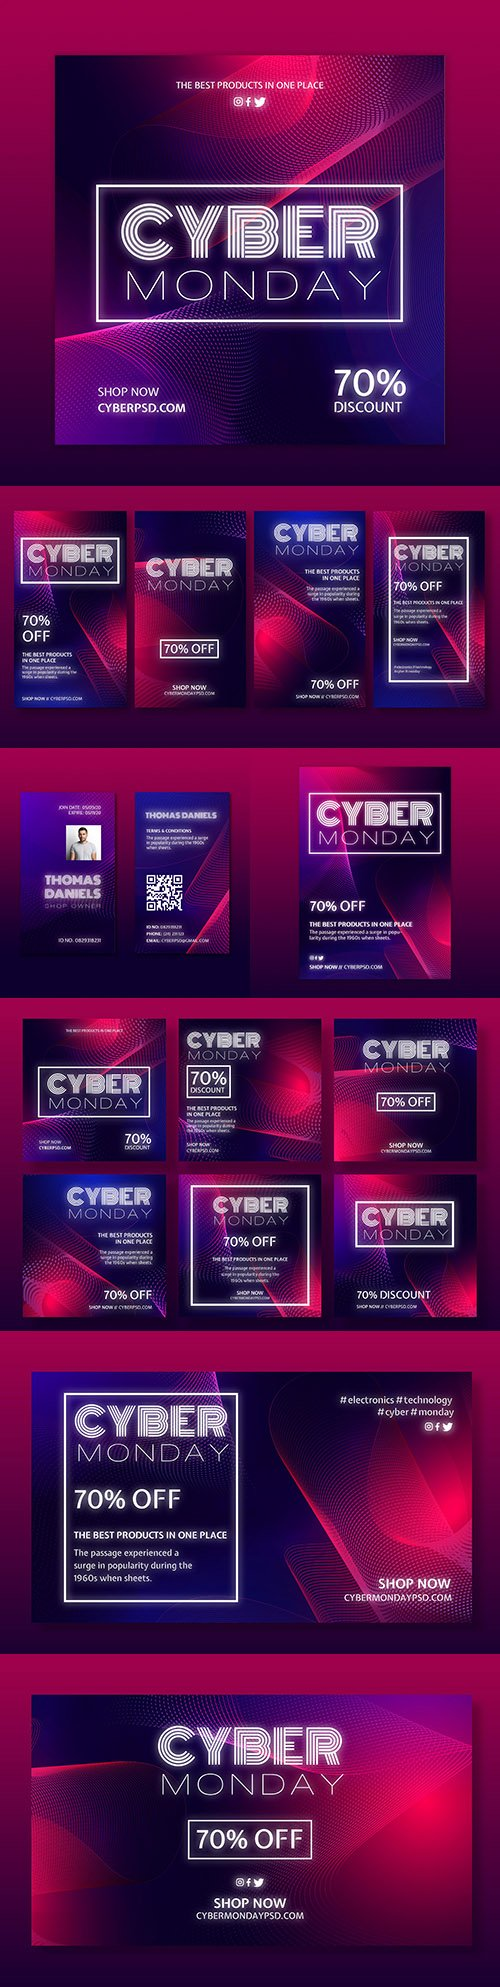 Cyber Monday sale design illustration template